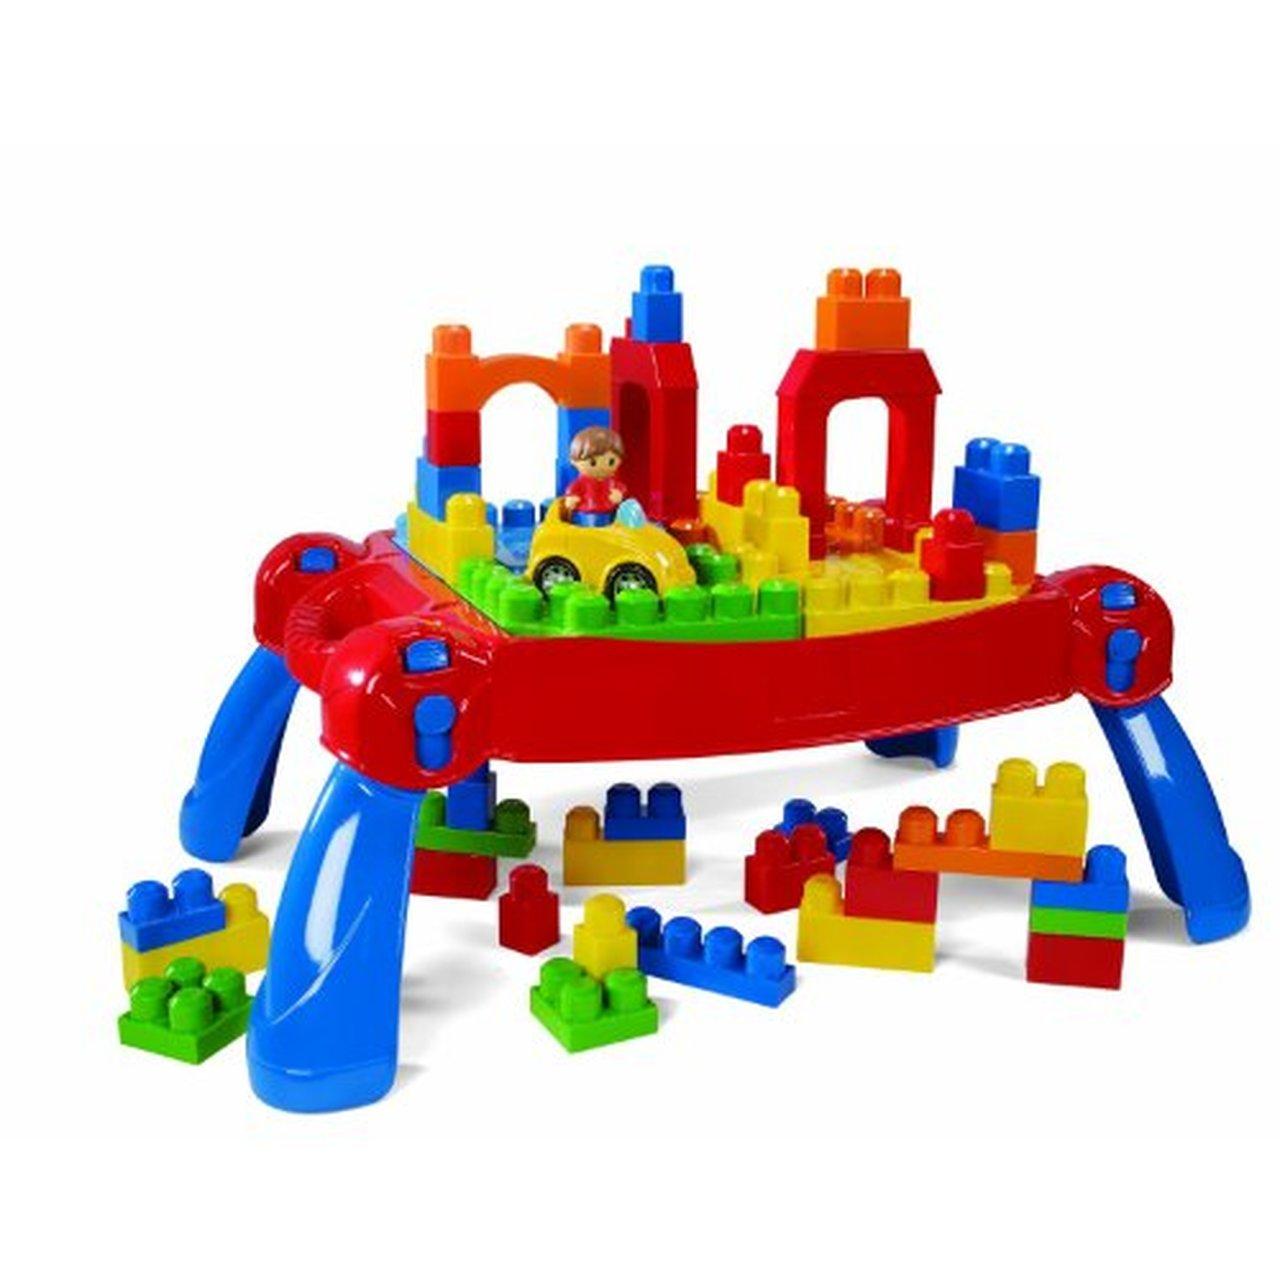 Mega Bloks Play 'n Go Table (Colors May Vary)